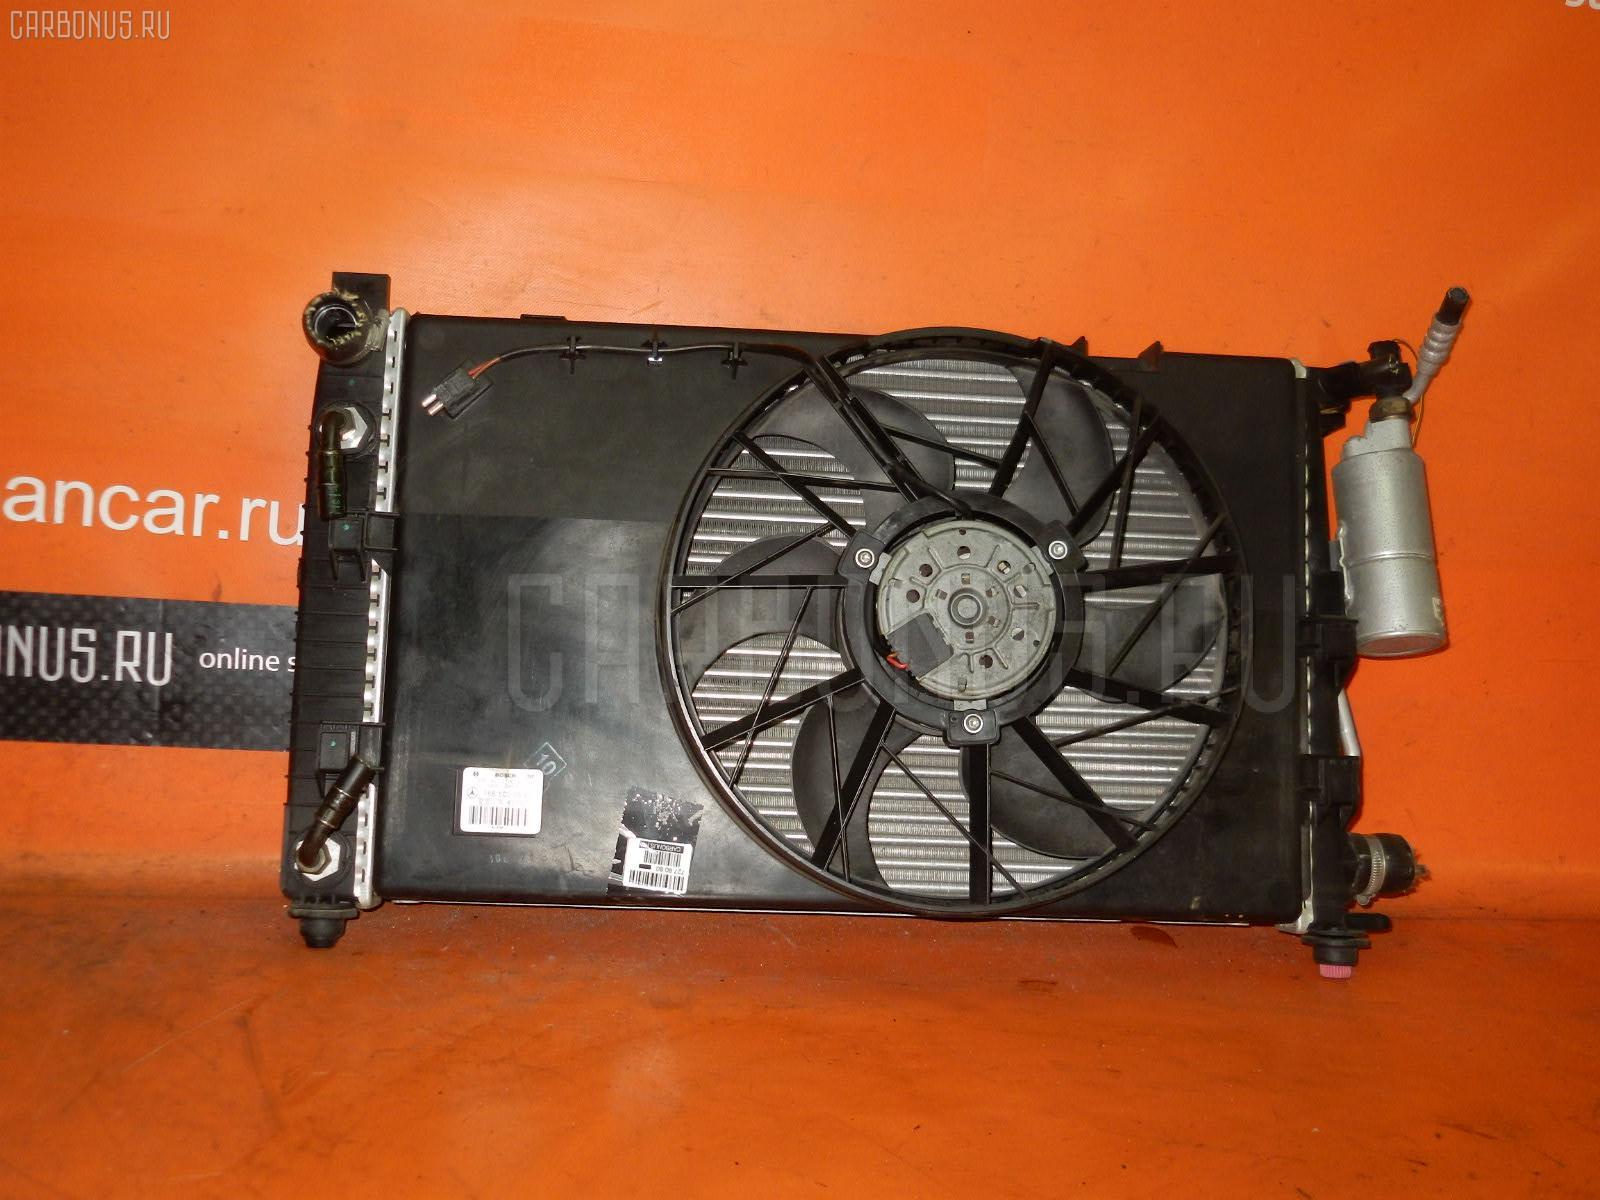 Радиатор ДВС MERCEDES-BENZ A-CLASS W168.033 166.960 Фото 1